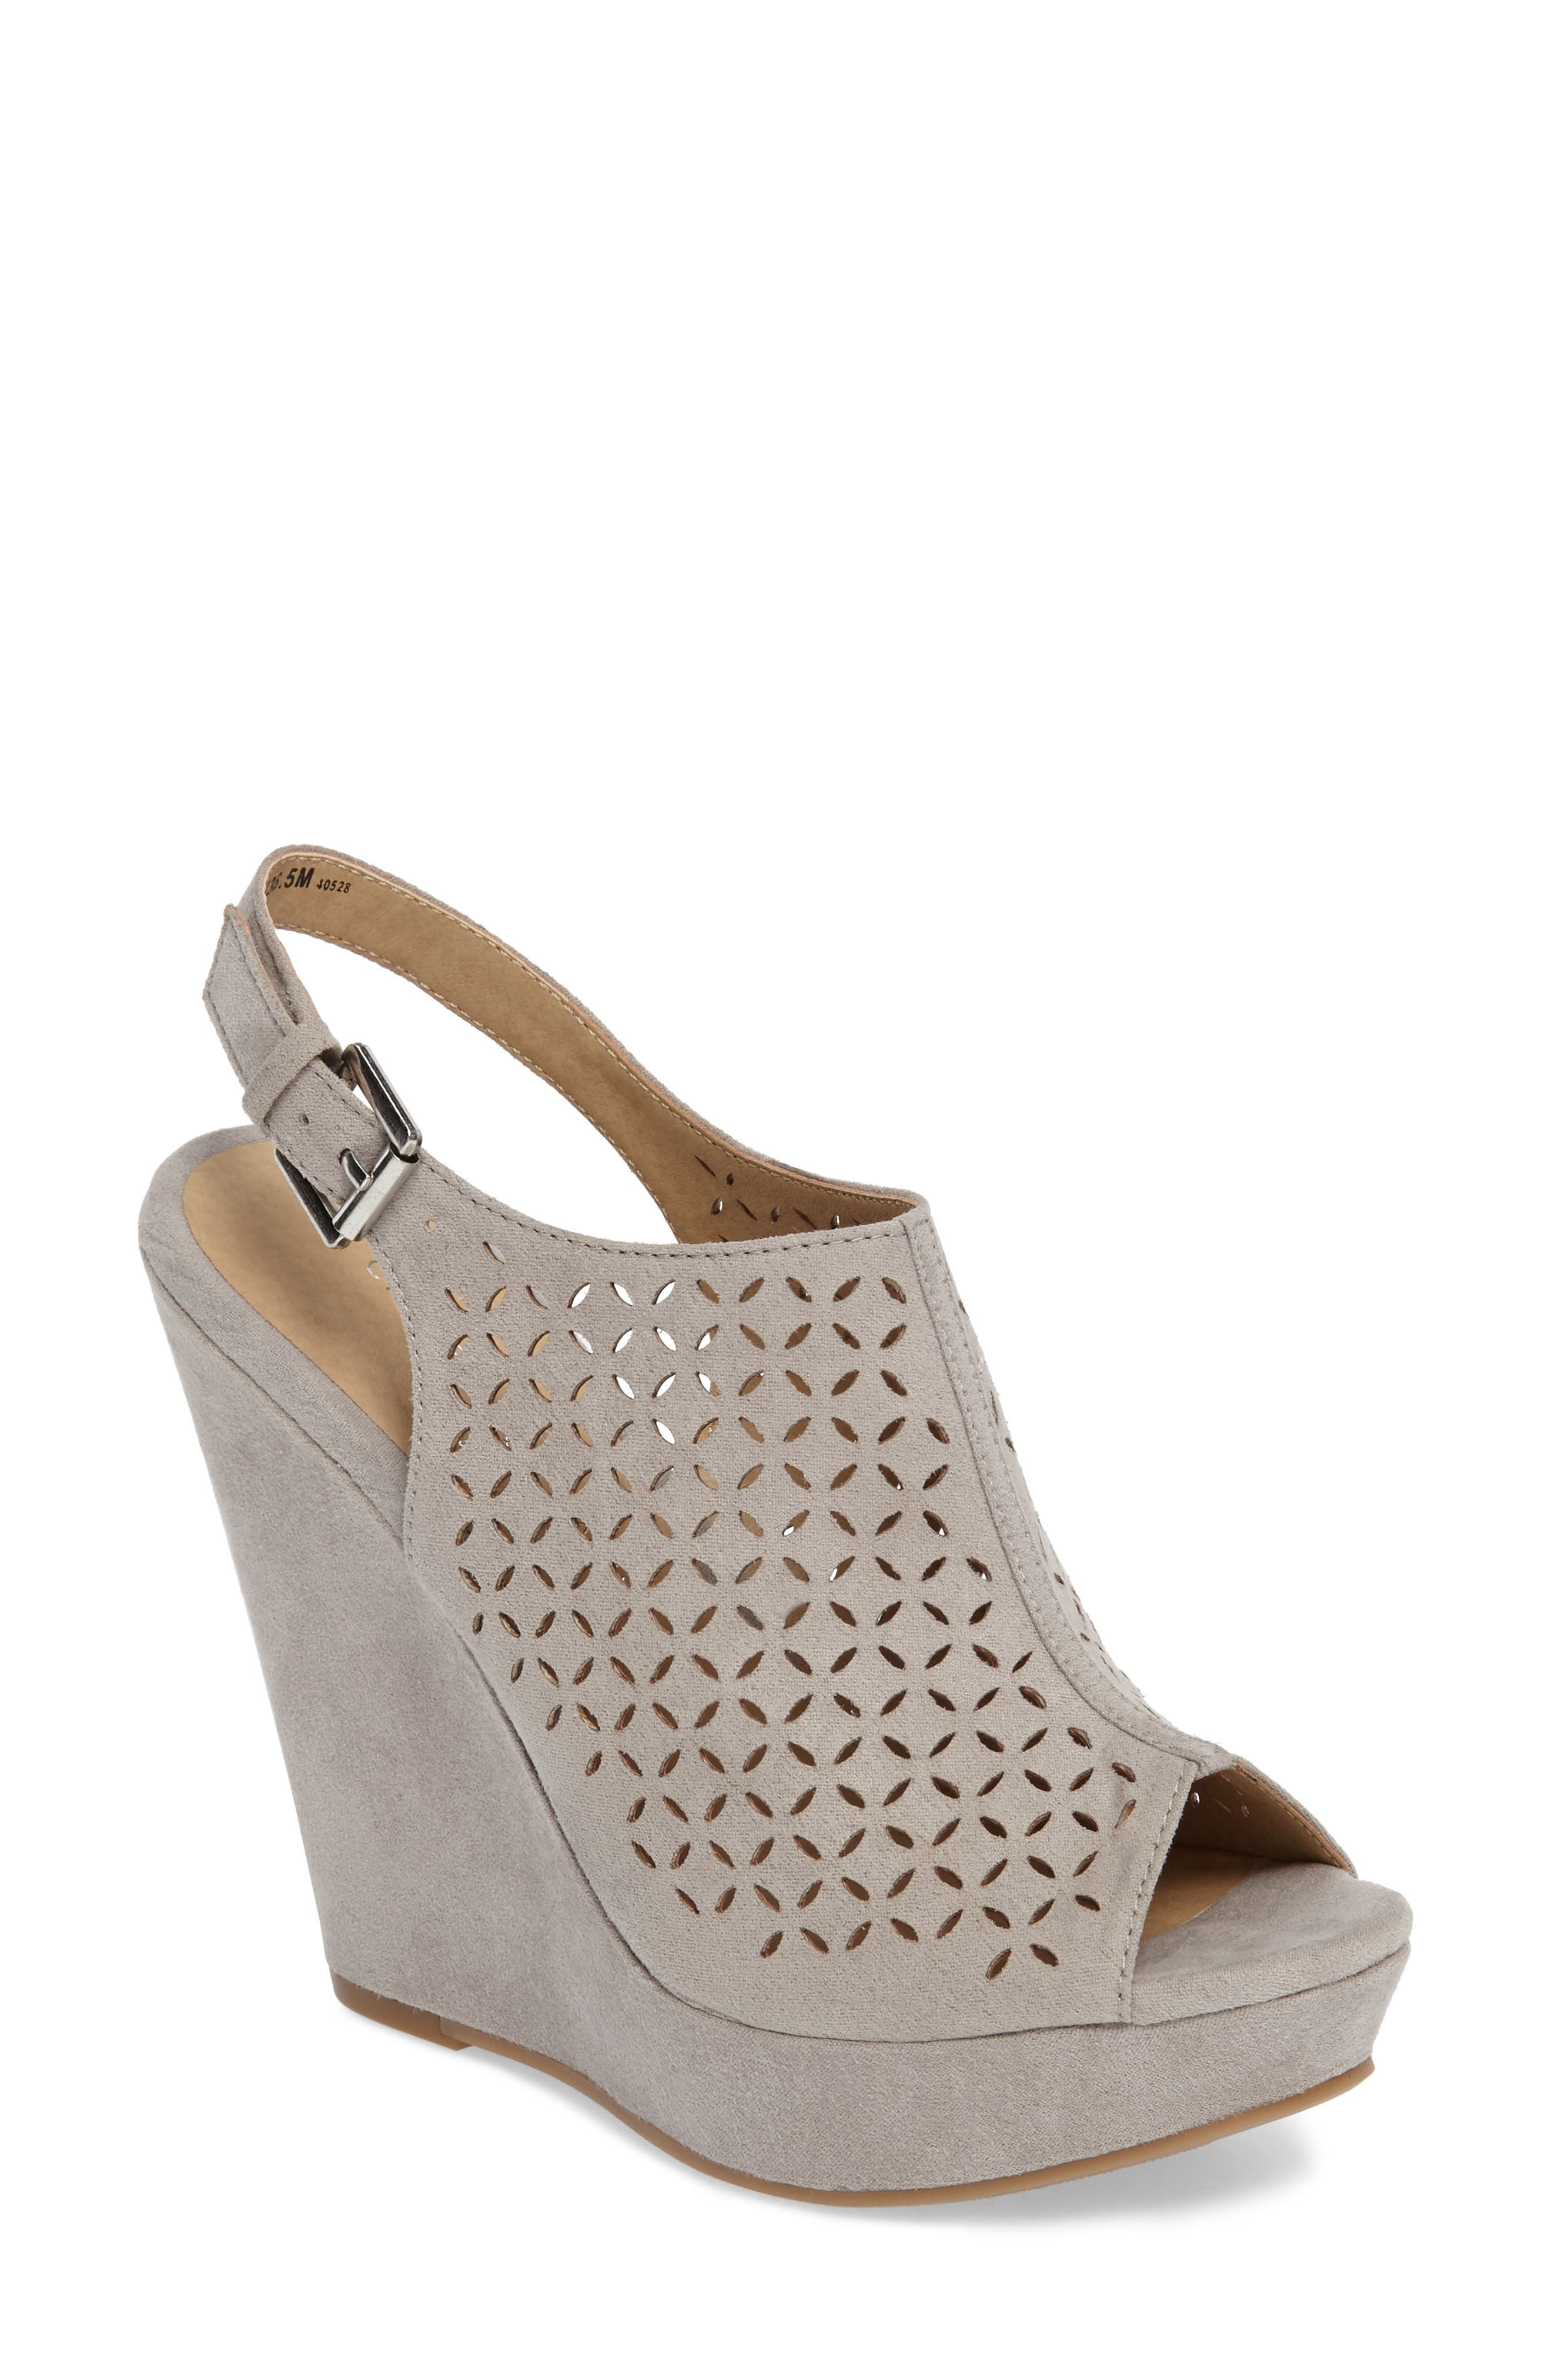 Chinese Laundry Matilda Wedge Sandal (Women)